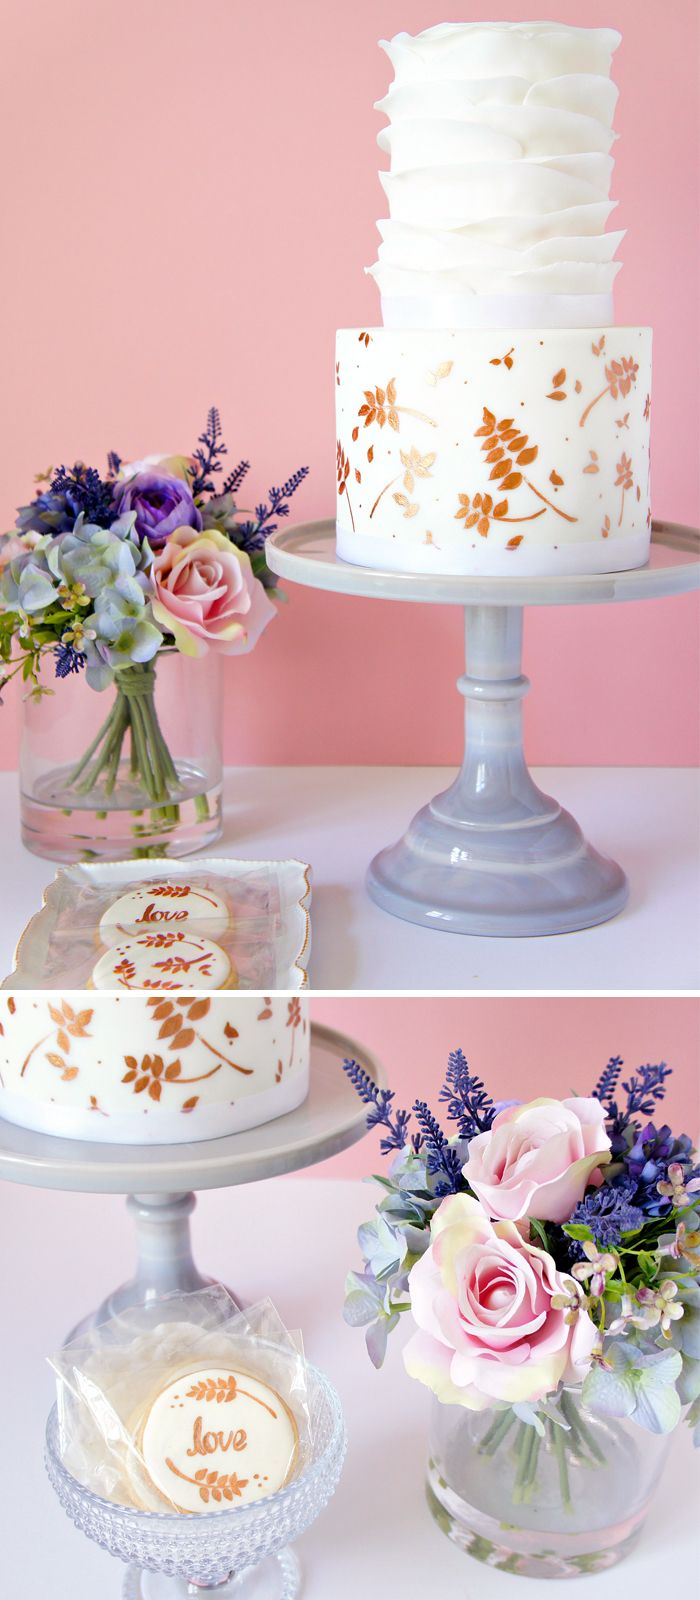 Amazing Ways to Create the Perfect Wedding Cake Display | Pinterest ...